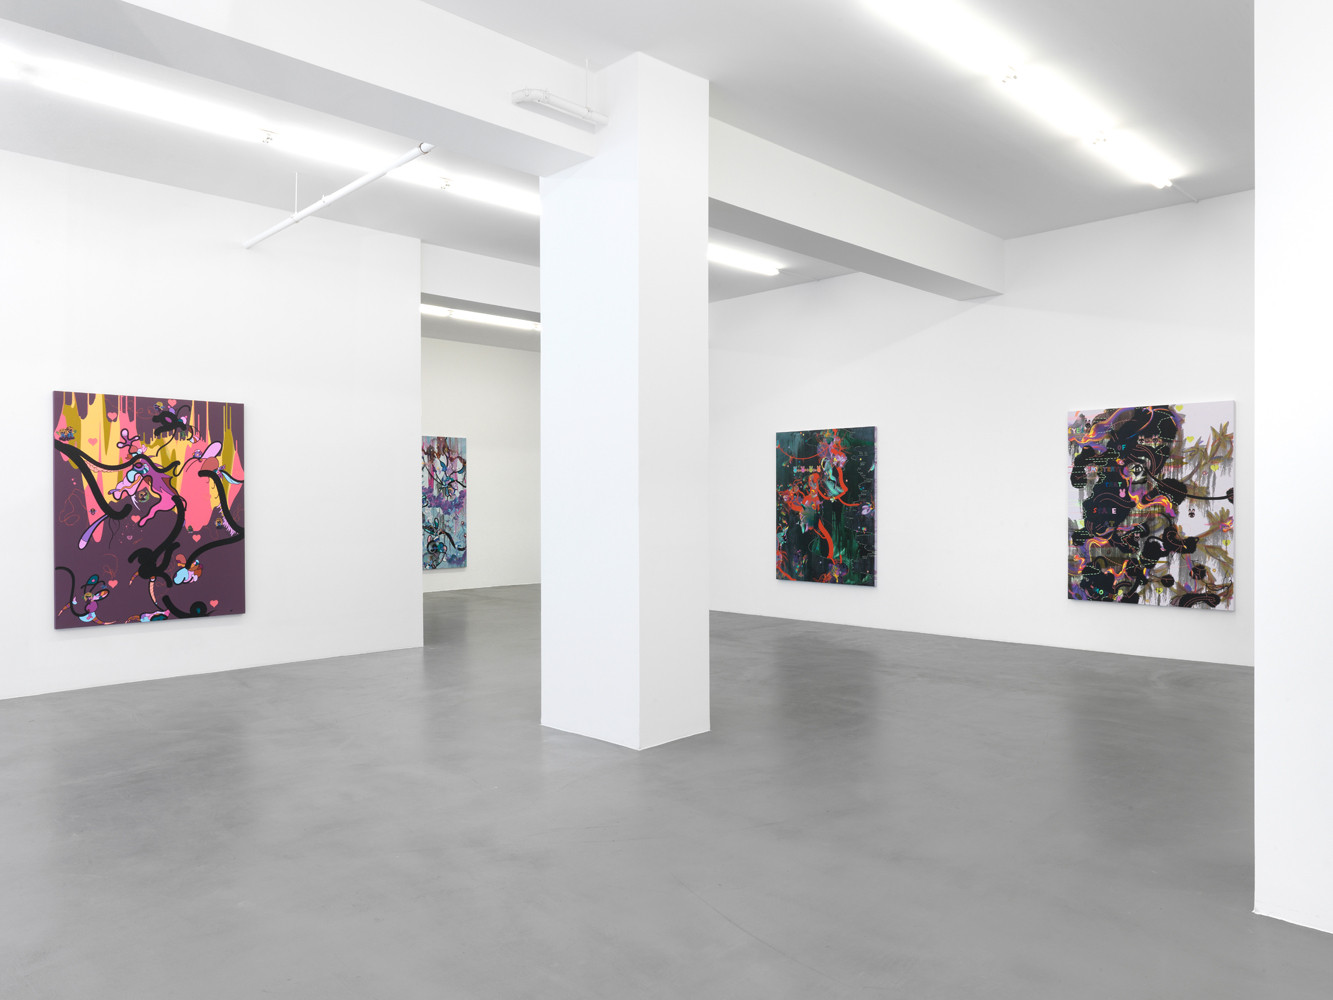 Fiona Rae, Installation view, Buchmann Galerie, 2011